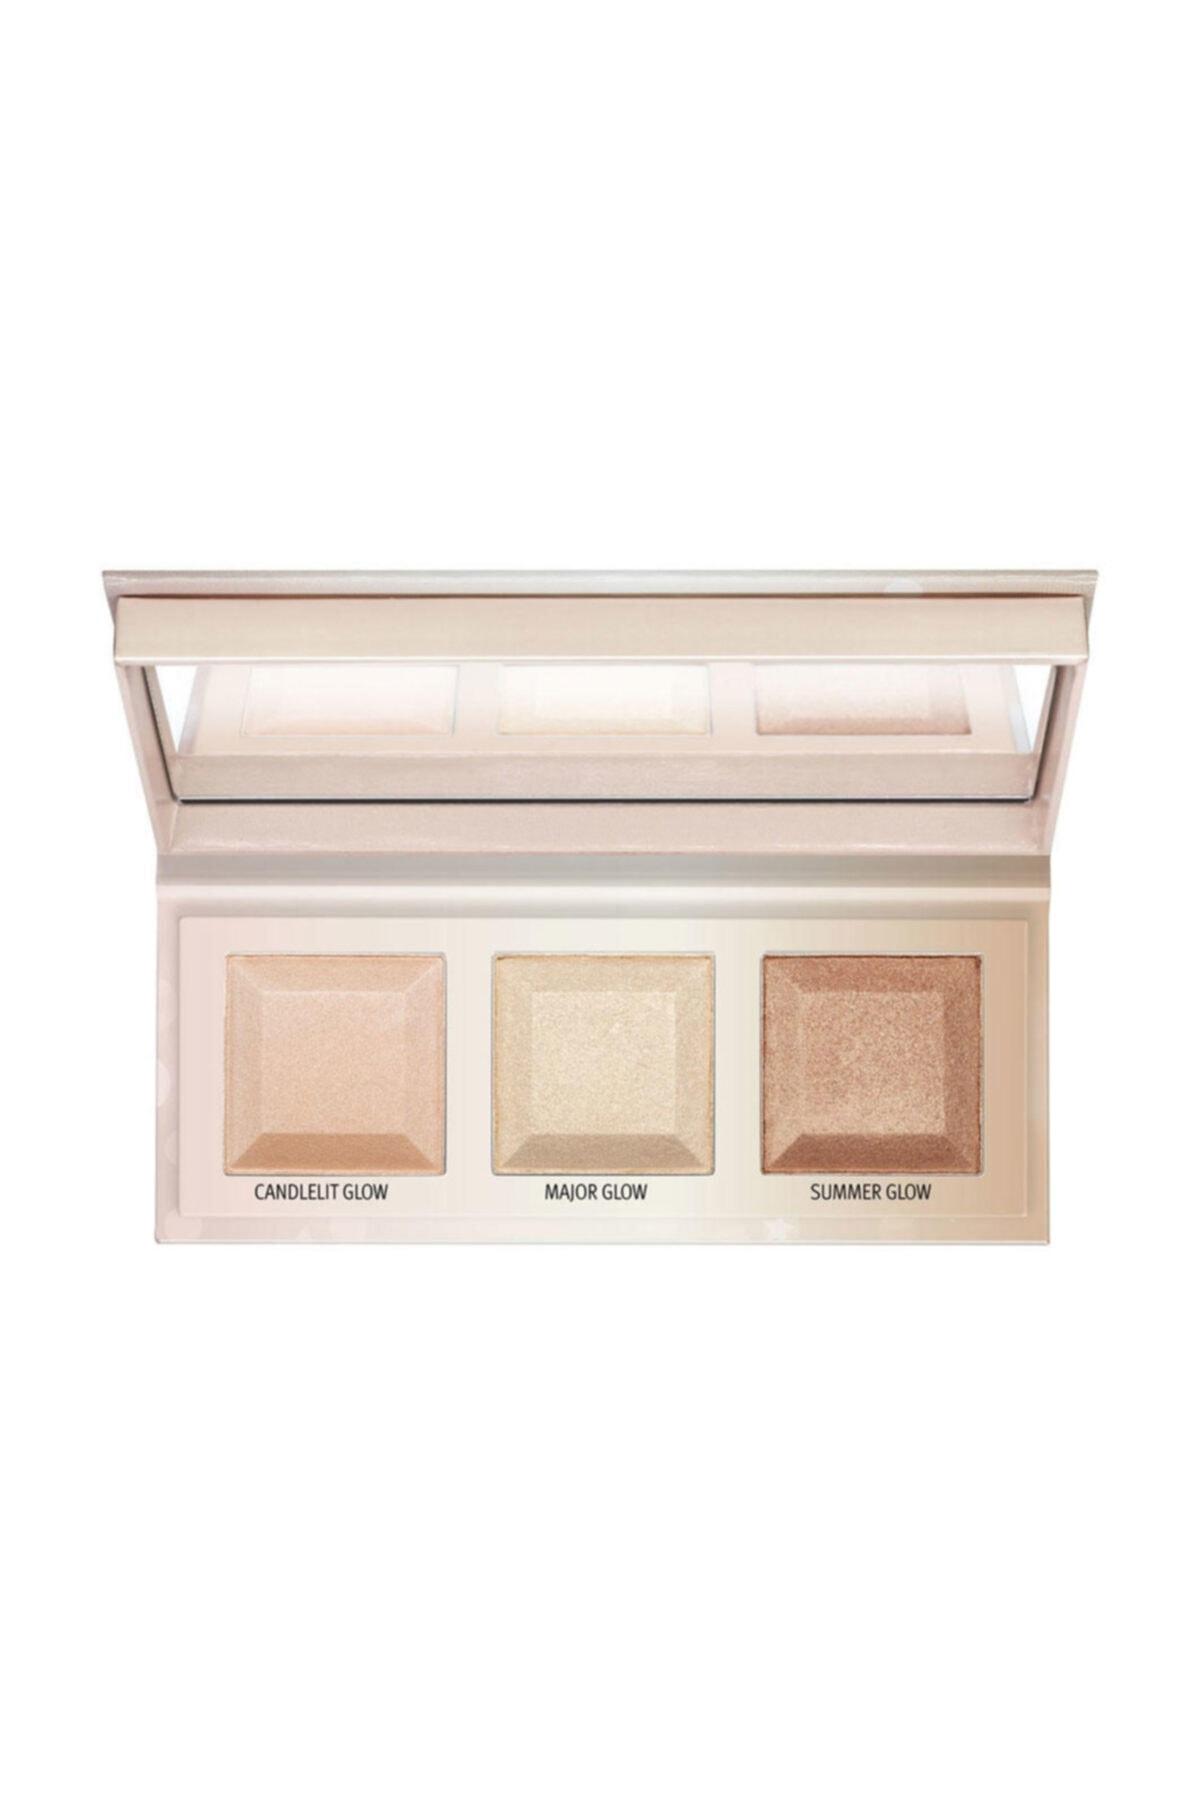 Essence Aydınlatıcı Palet Choose Your Glow Highlighter Palette 18g 1